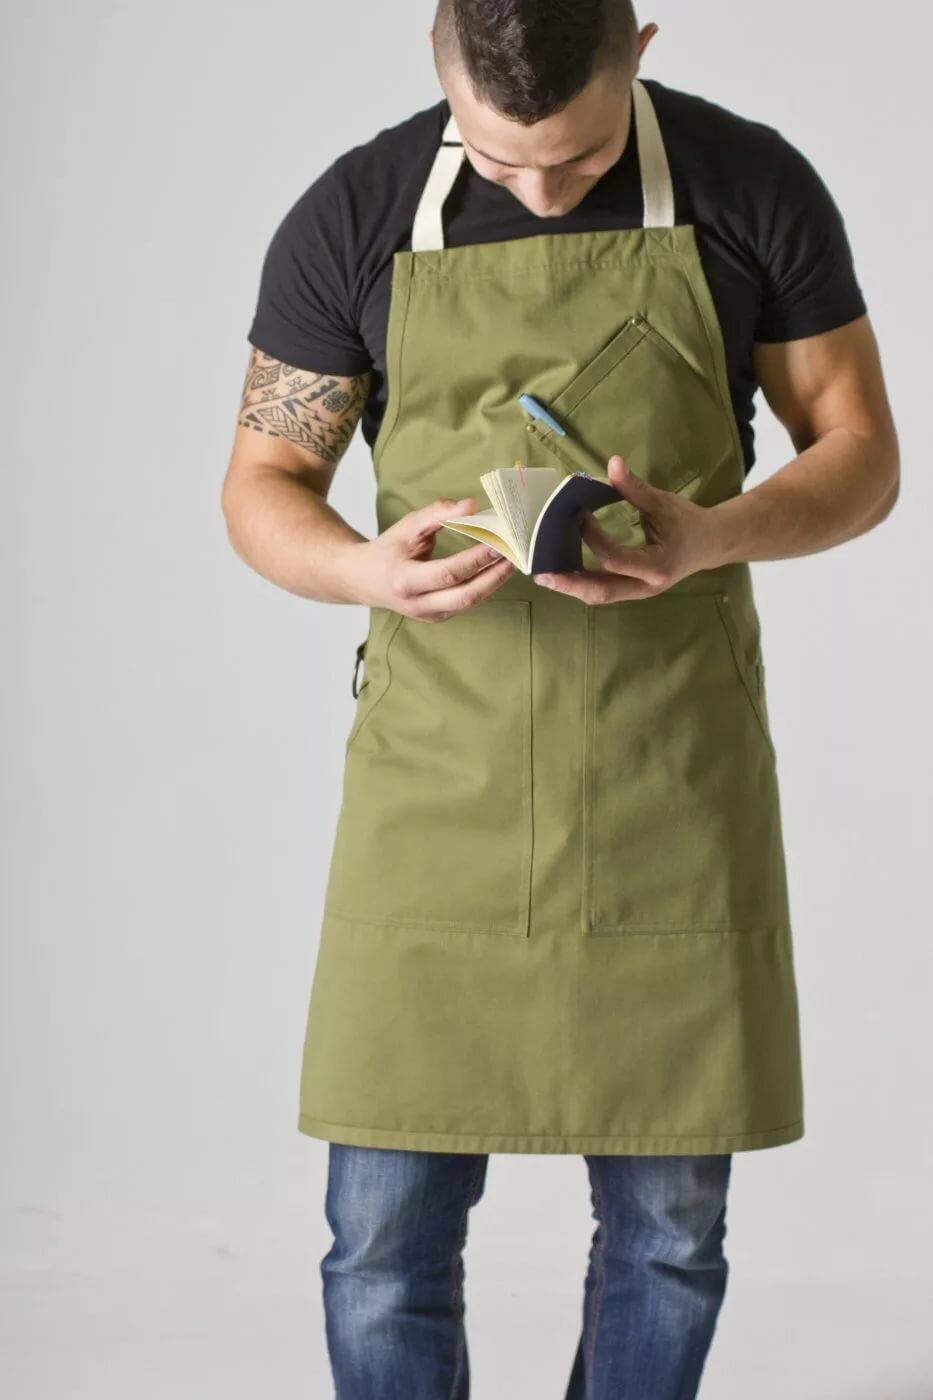 фартук для мужчин картинки кухня постройка первой